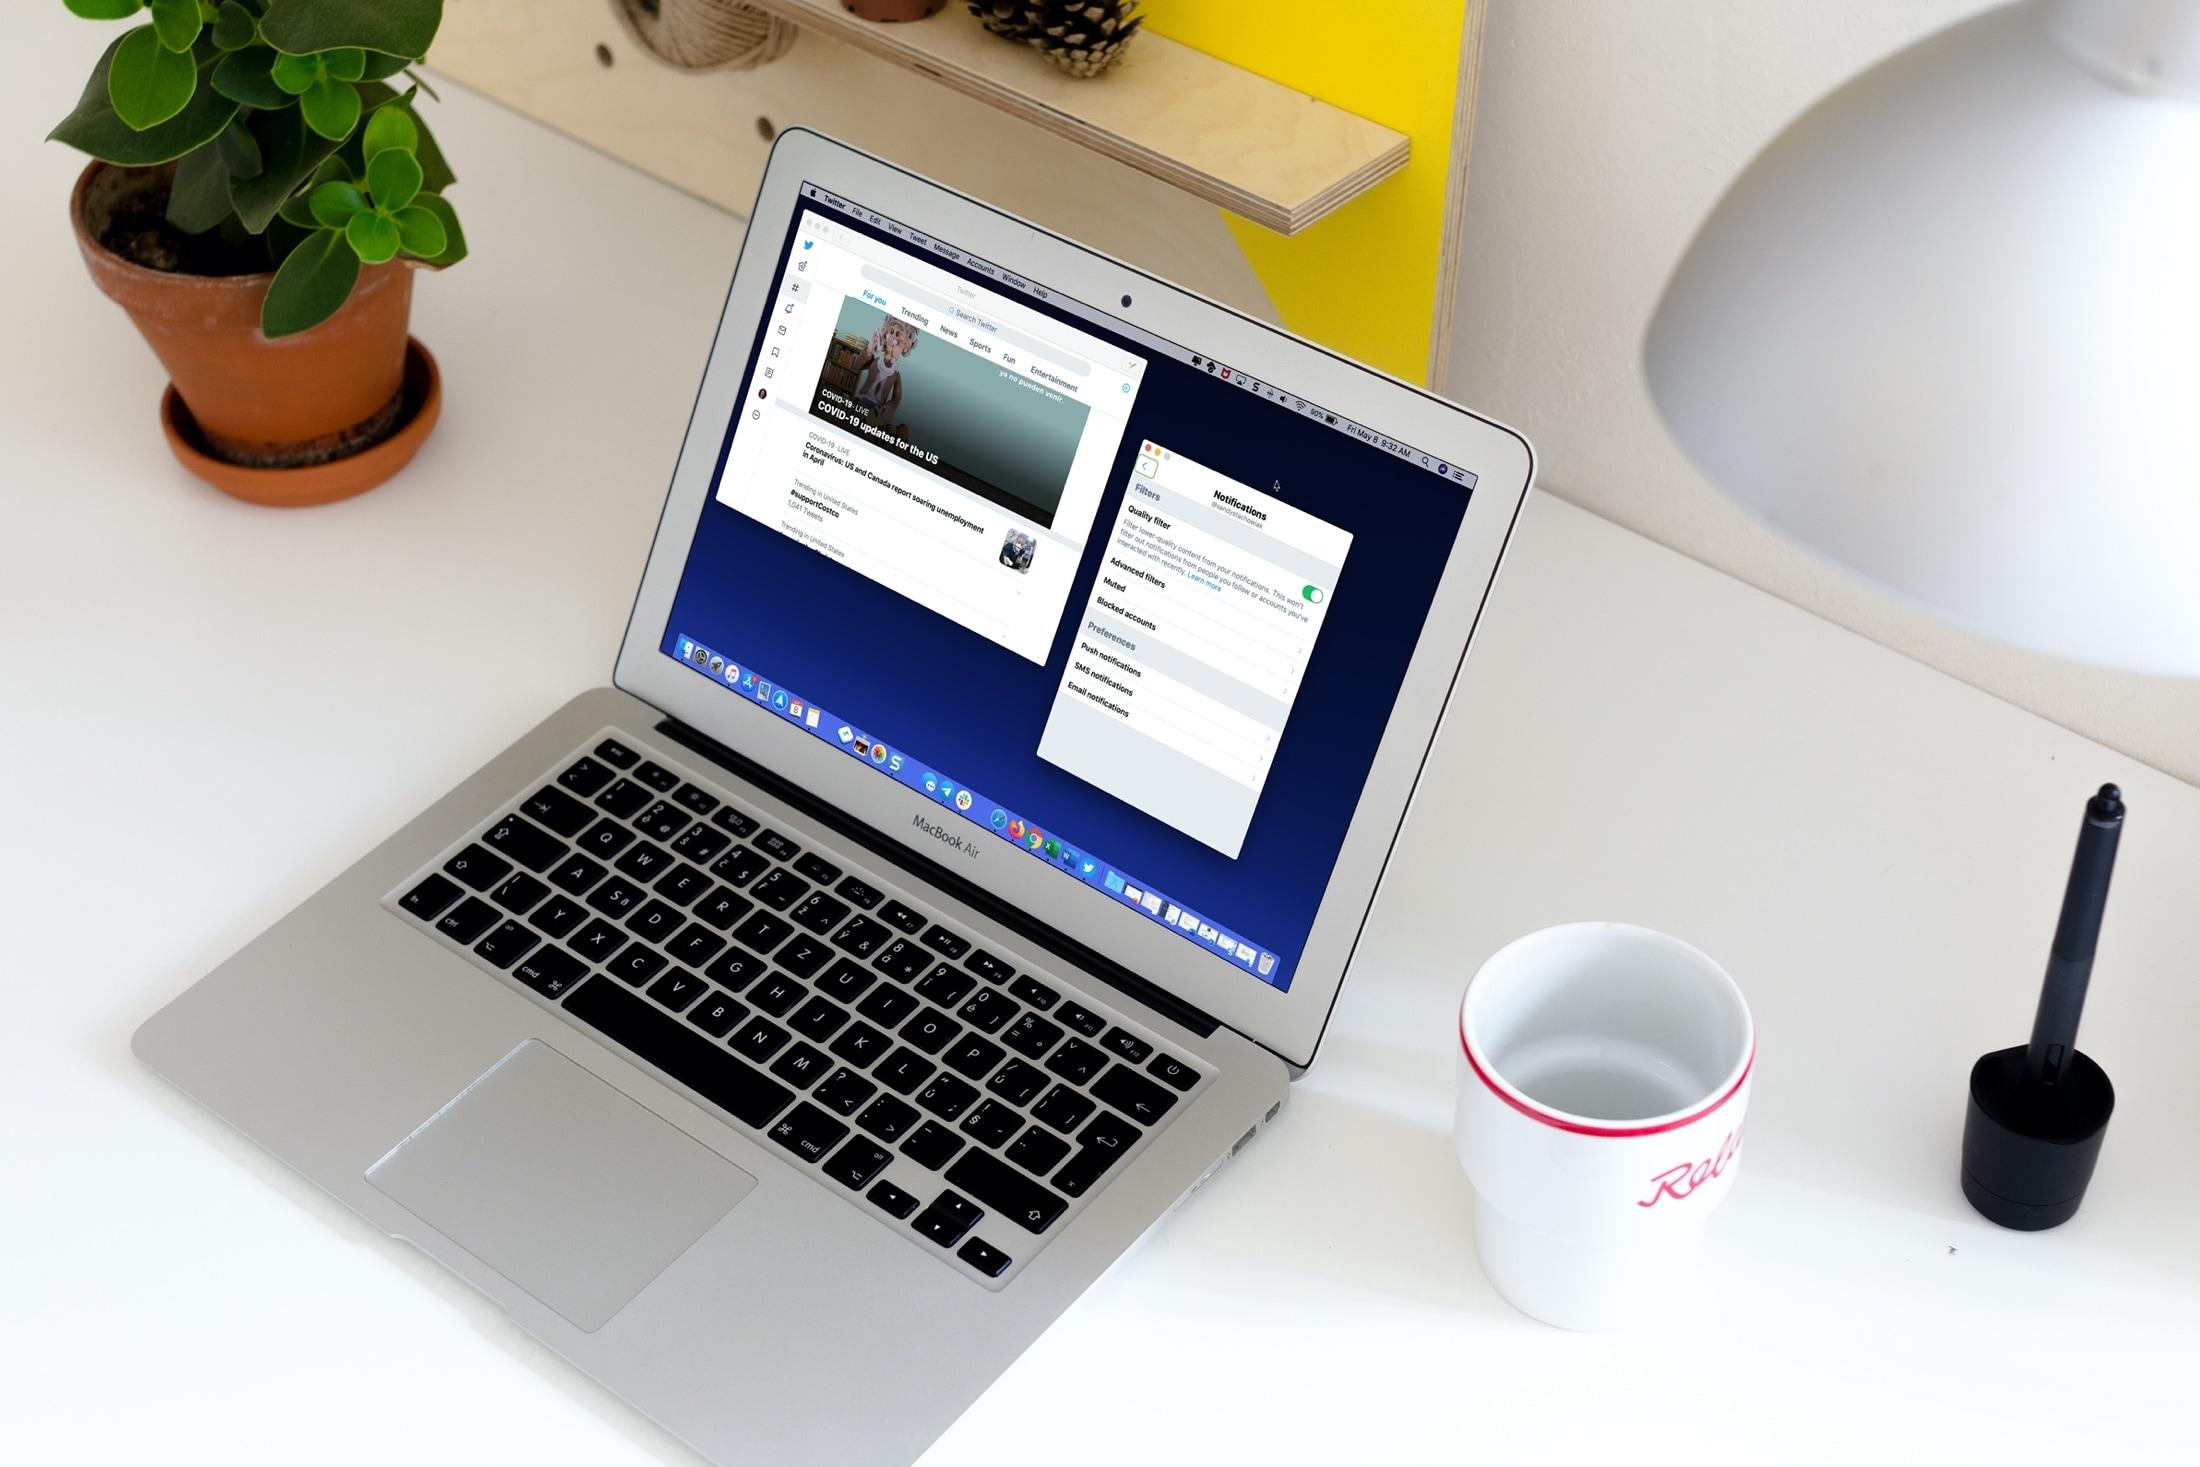 Twitter app and Notifications MacBook